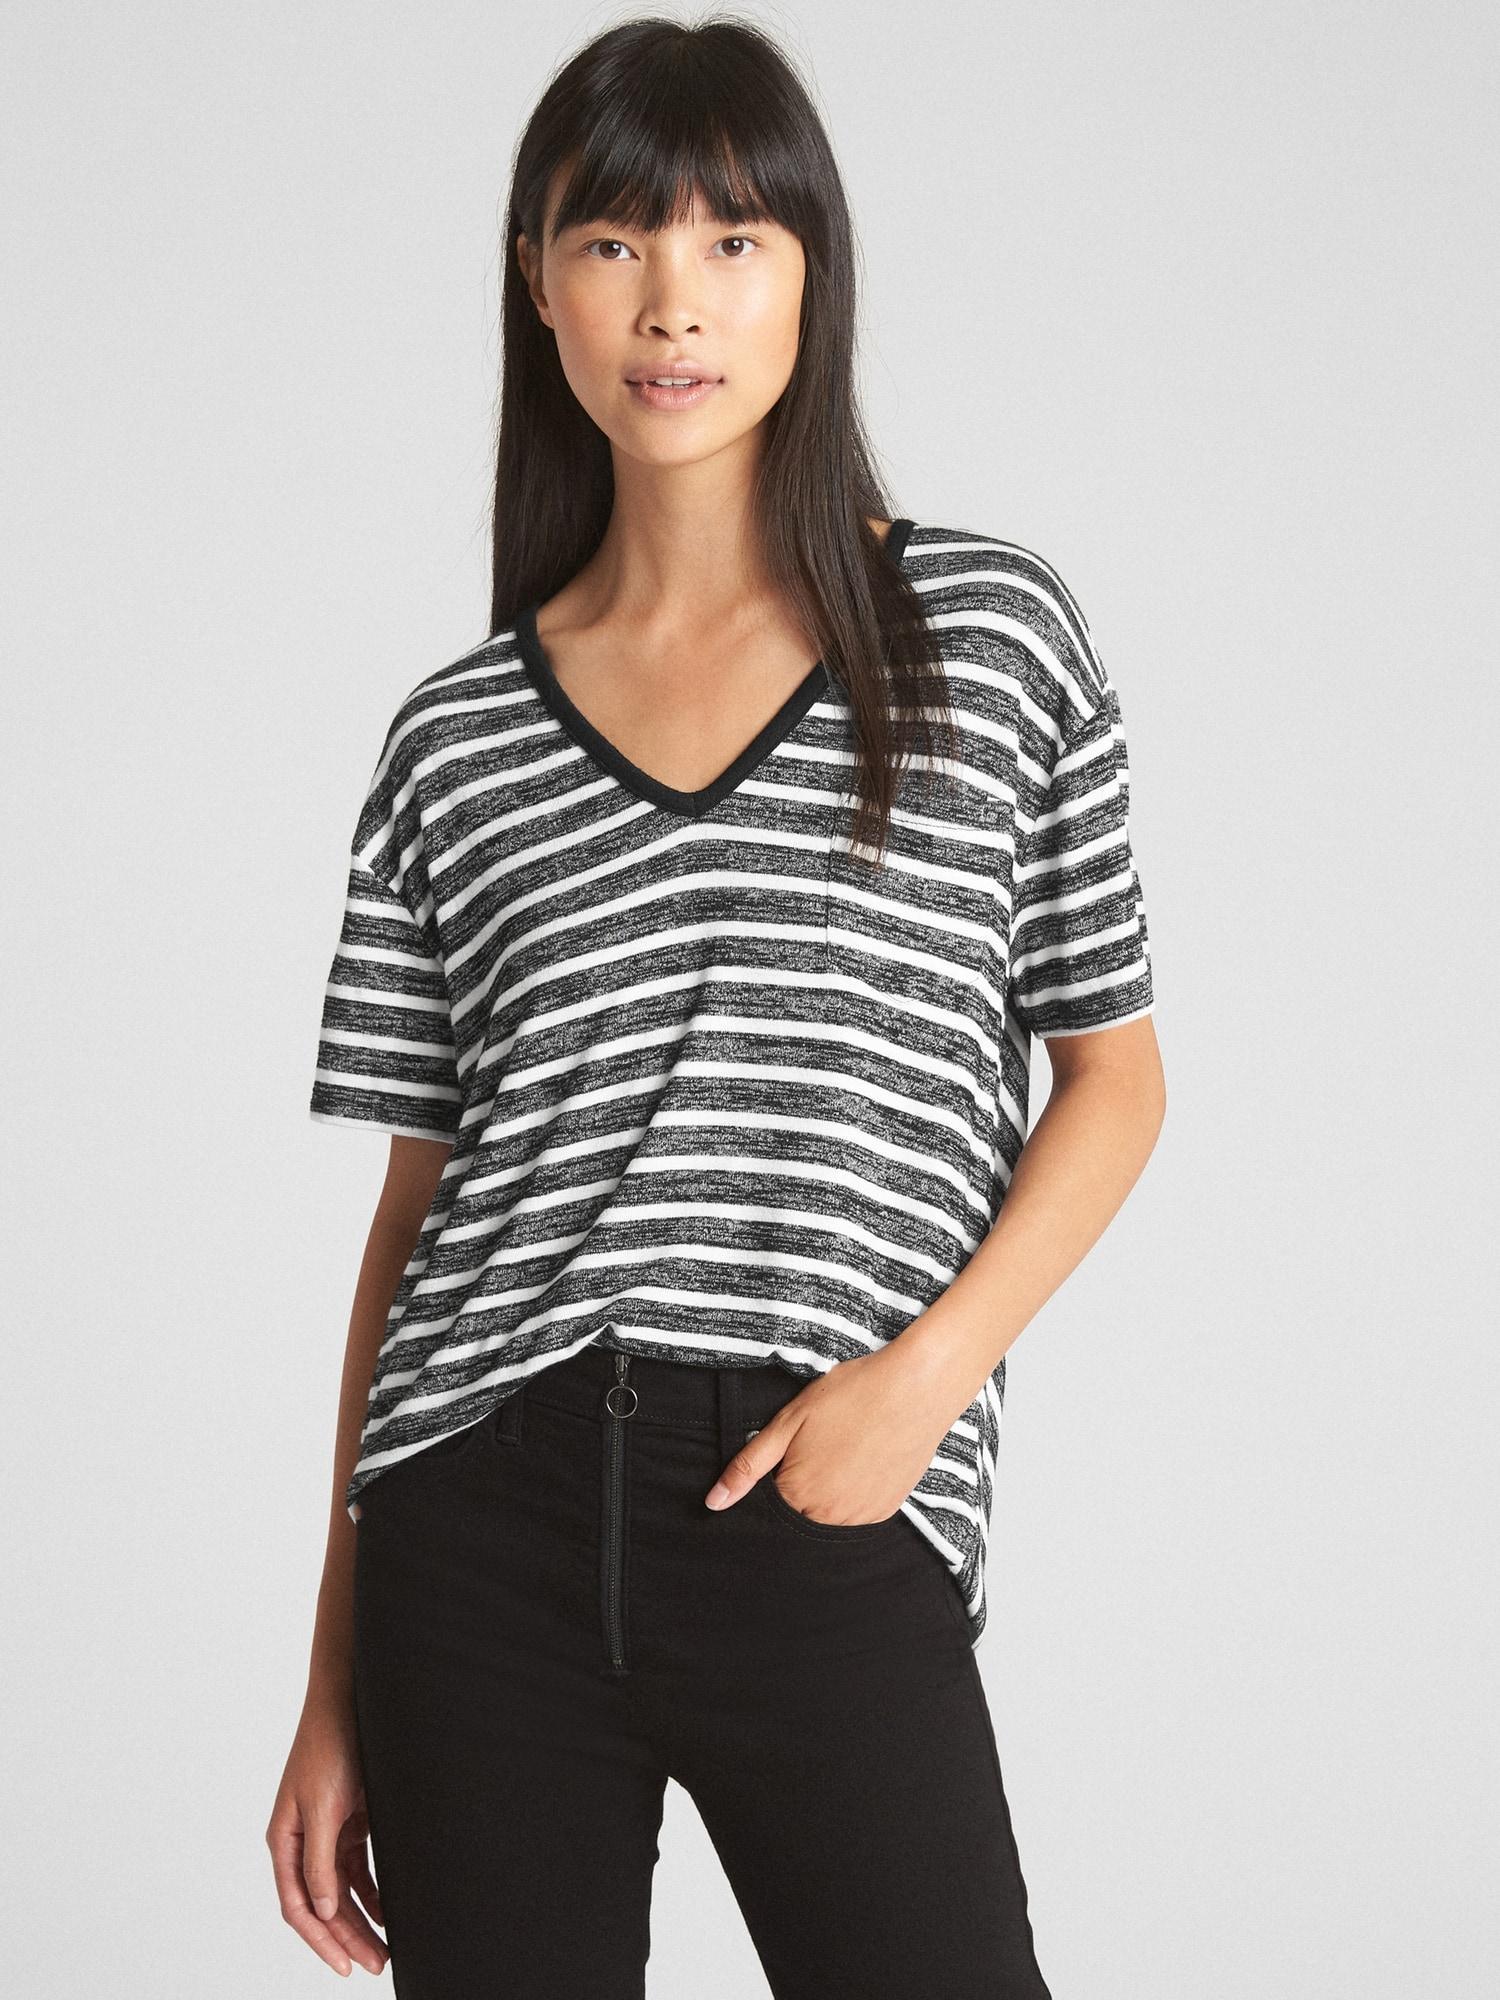 022a2bc8c74e8 Lyst - Gap Softspun Stripe V-neck Pocket T-shirt in Black